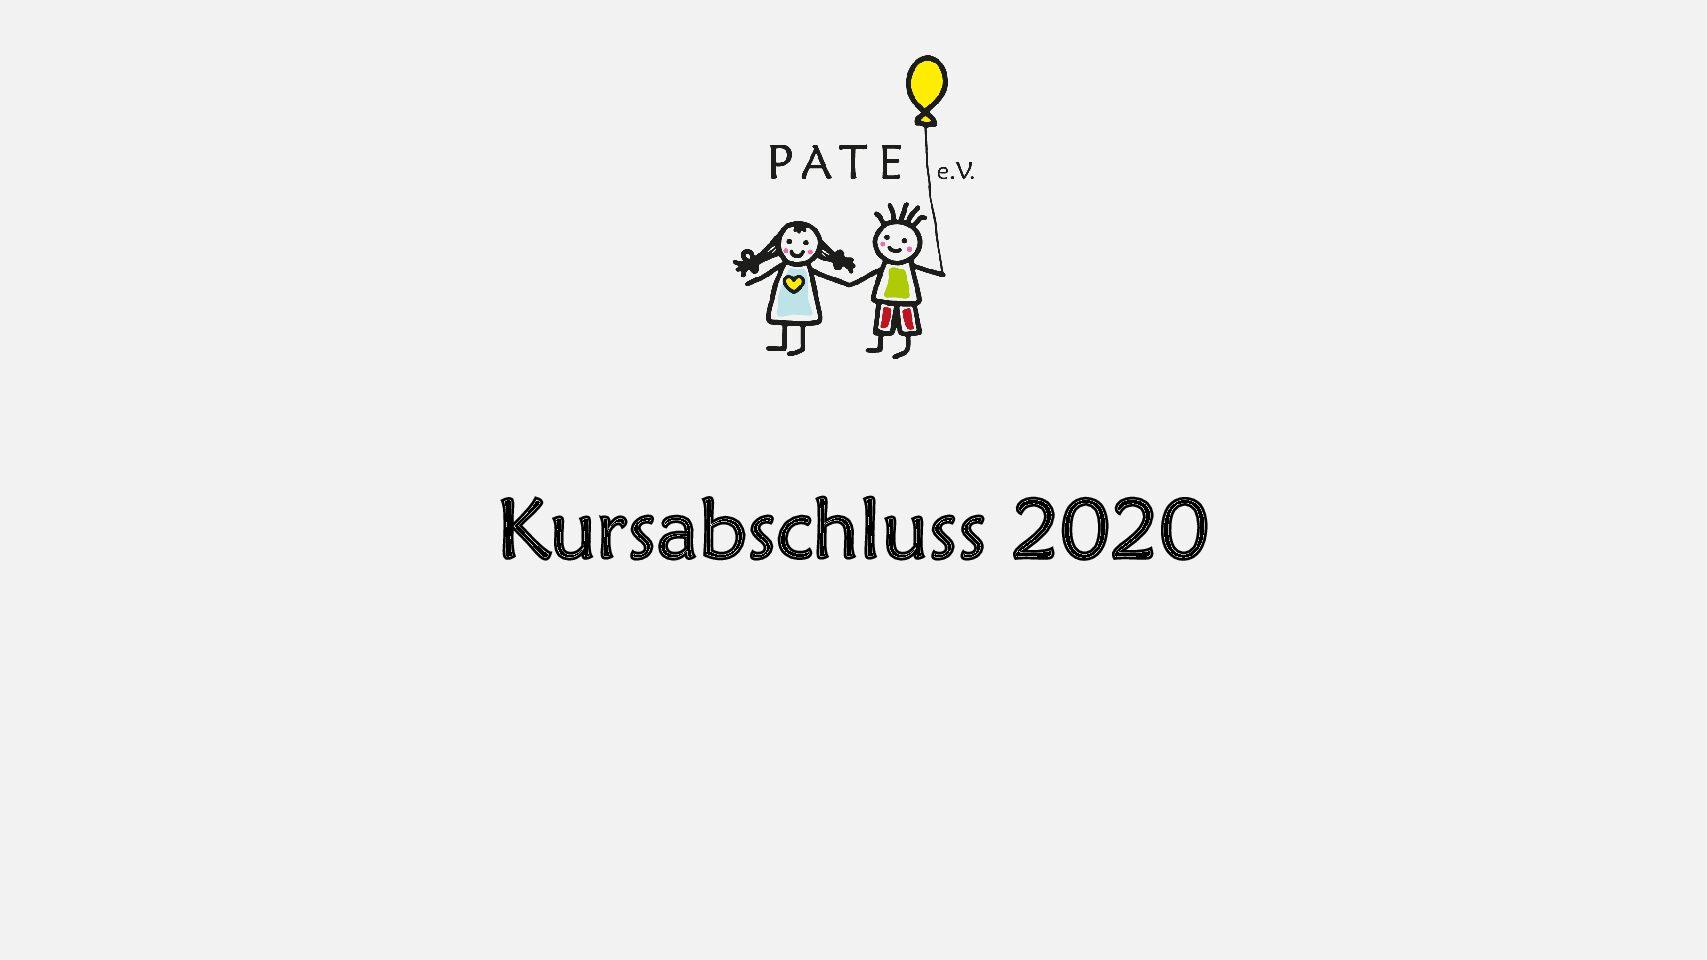 Kursabschluss 2020